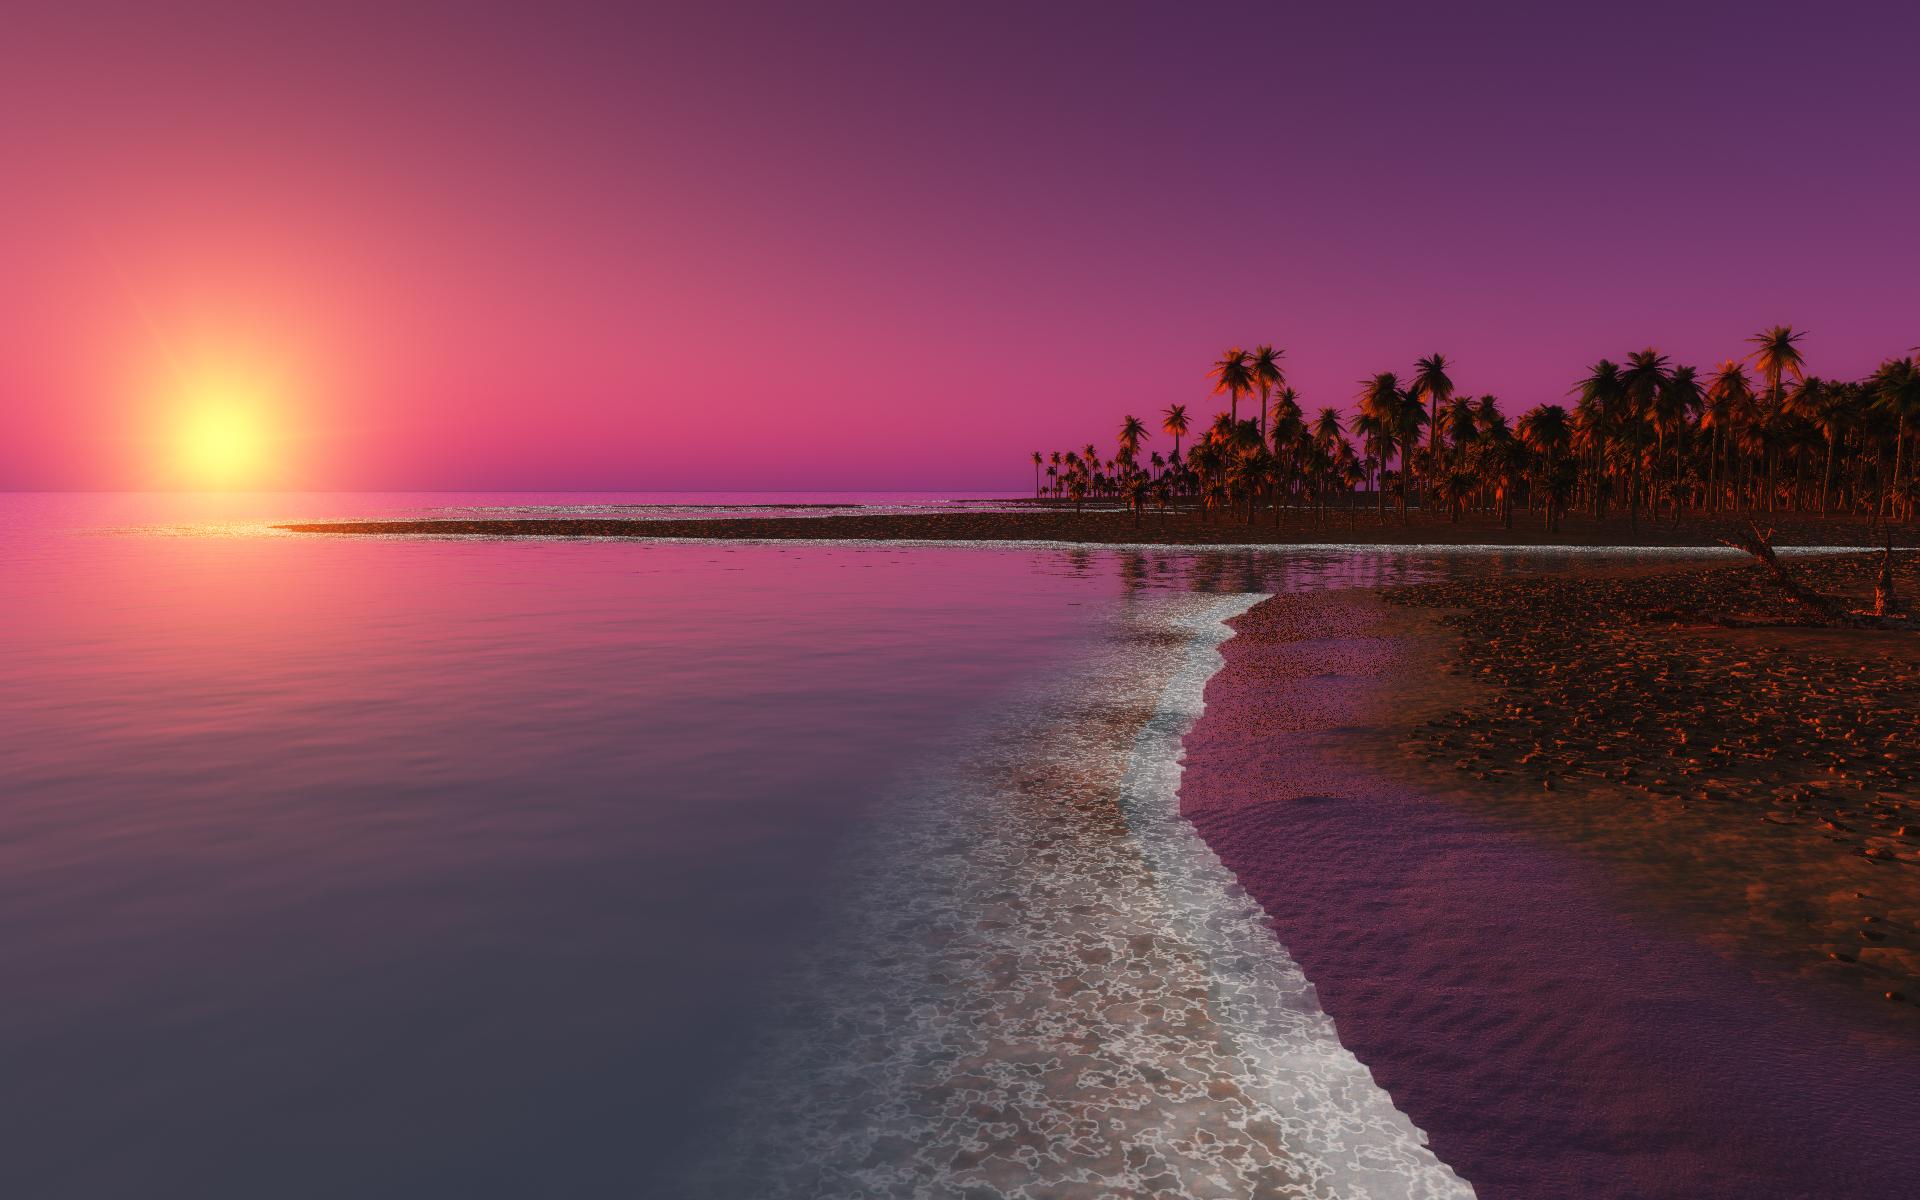 Purple Summer Desktop Wallpaper HD wallpaper background 1920x1200